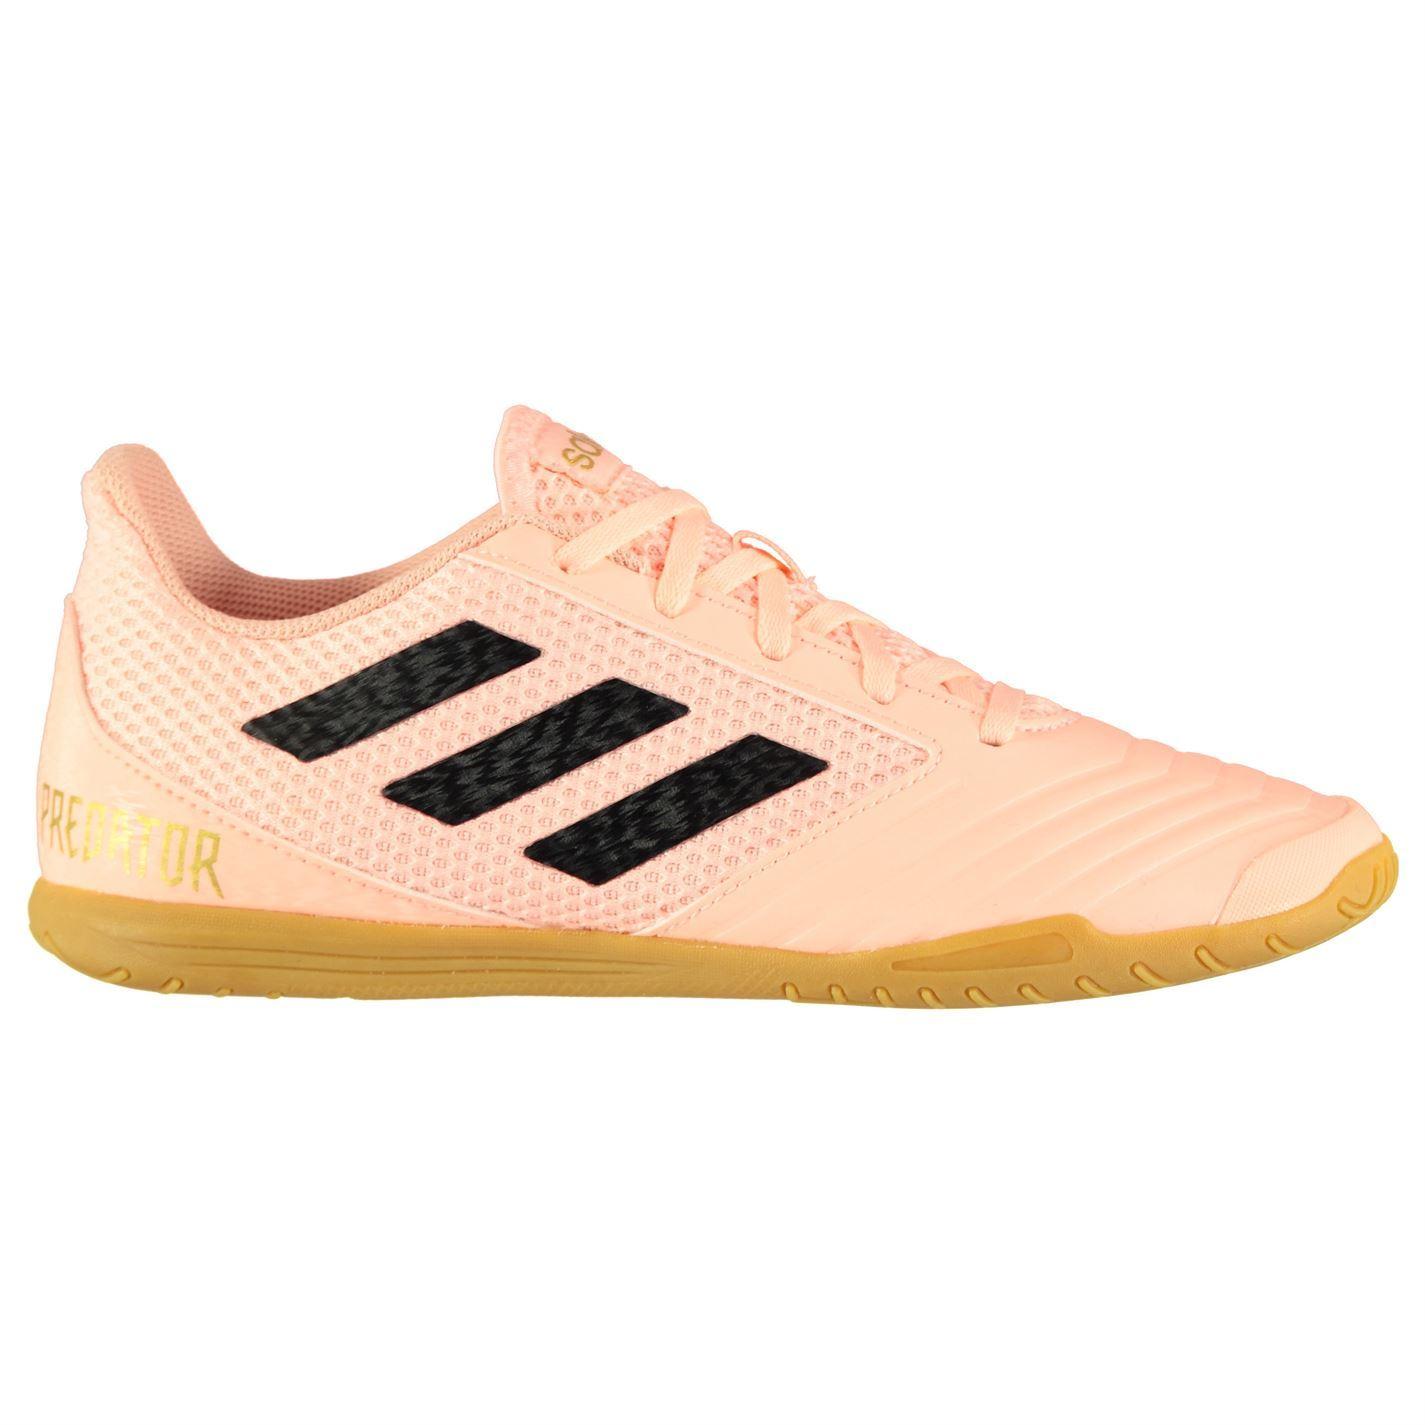 10b6a31e4 ... adidas Predator Tango 18.4 Sala Indoor Football Trainers Mens Soccer  Shoes